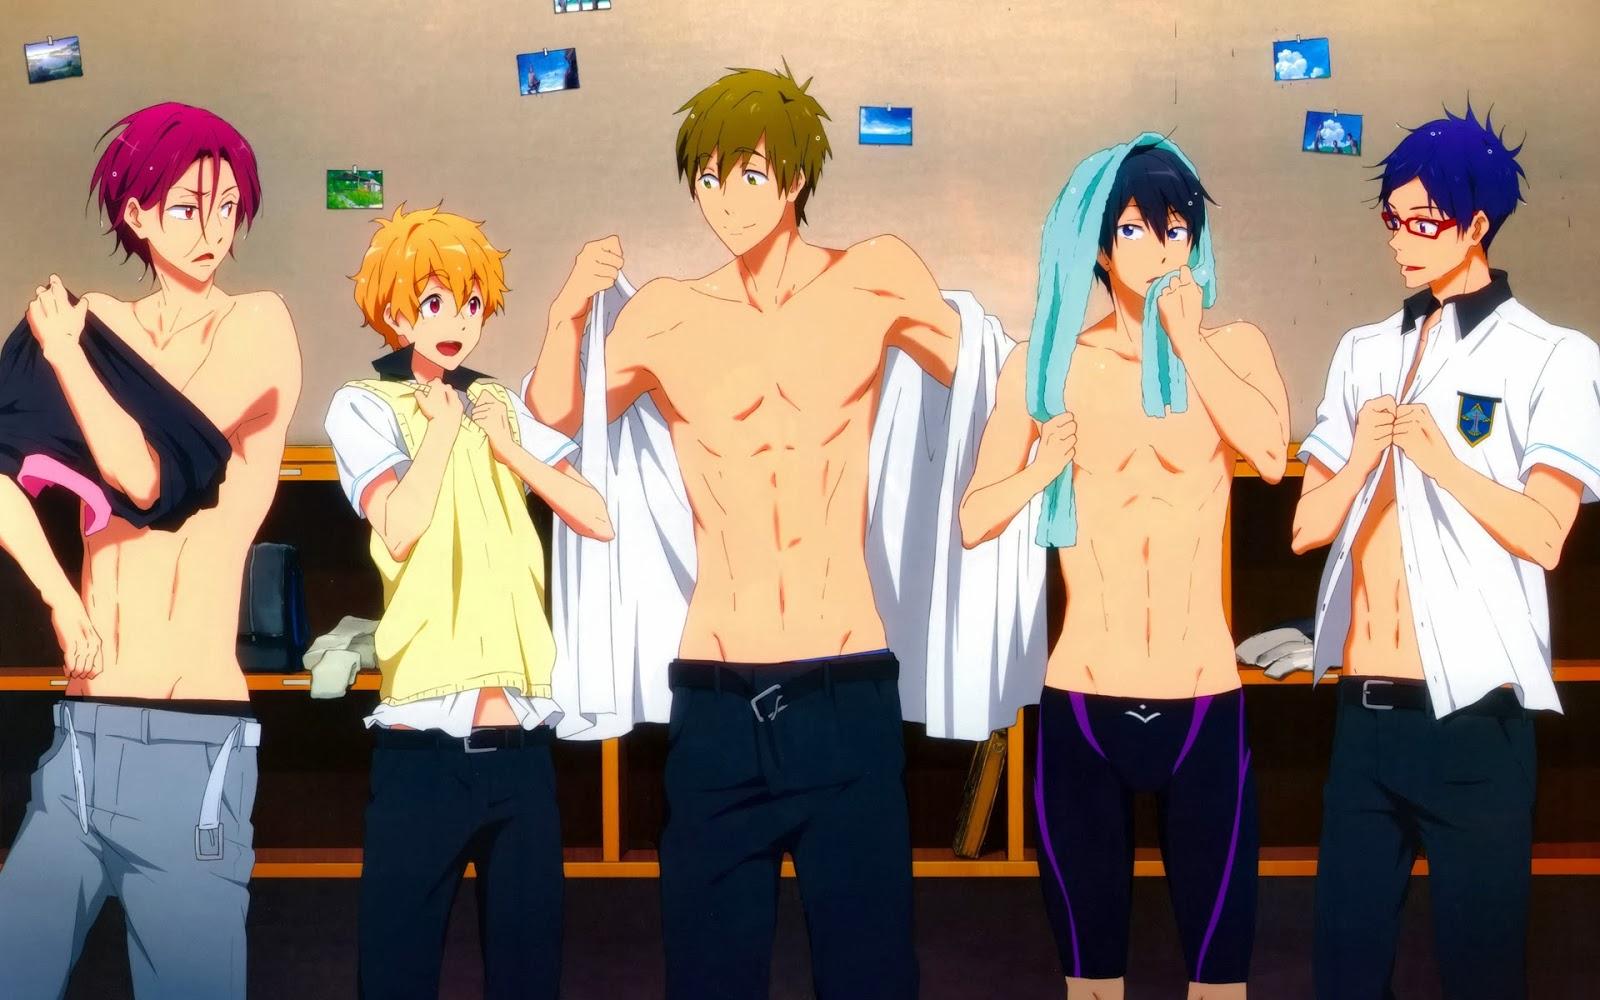 Free Anime 1600x1000 Download Hd Wallpaper Wallpapertip